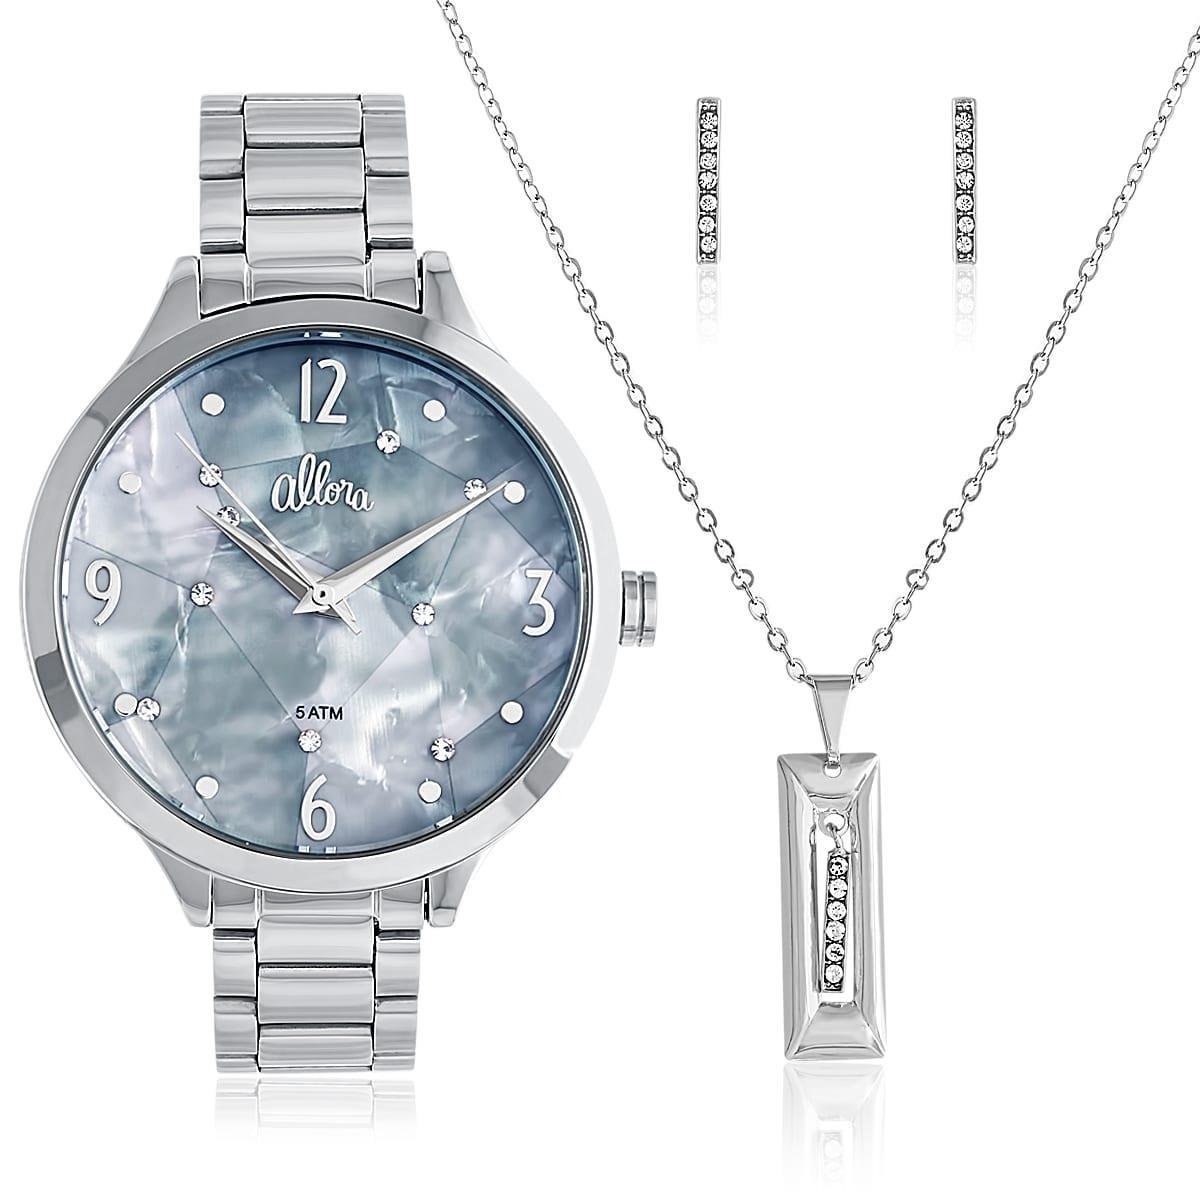 10d28d306 kit relógio feminino allora al2036fif prata colar brincos. Carregando zoom.